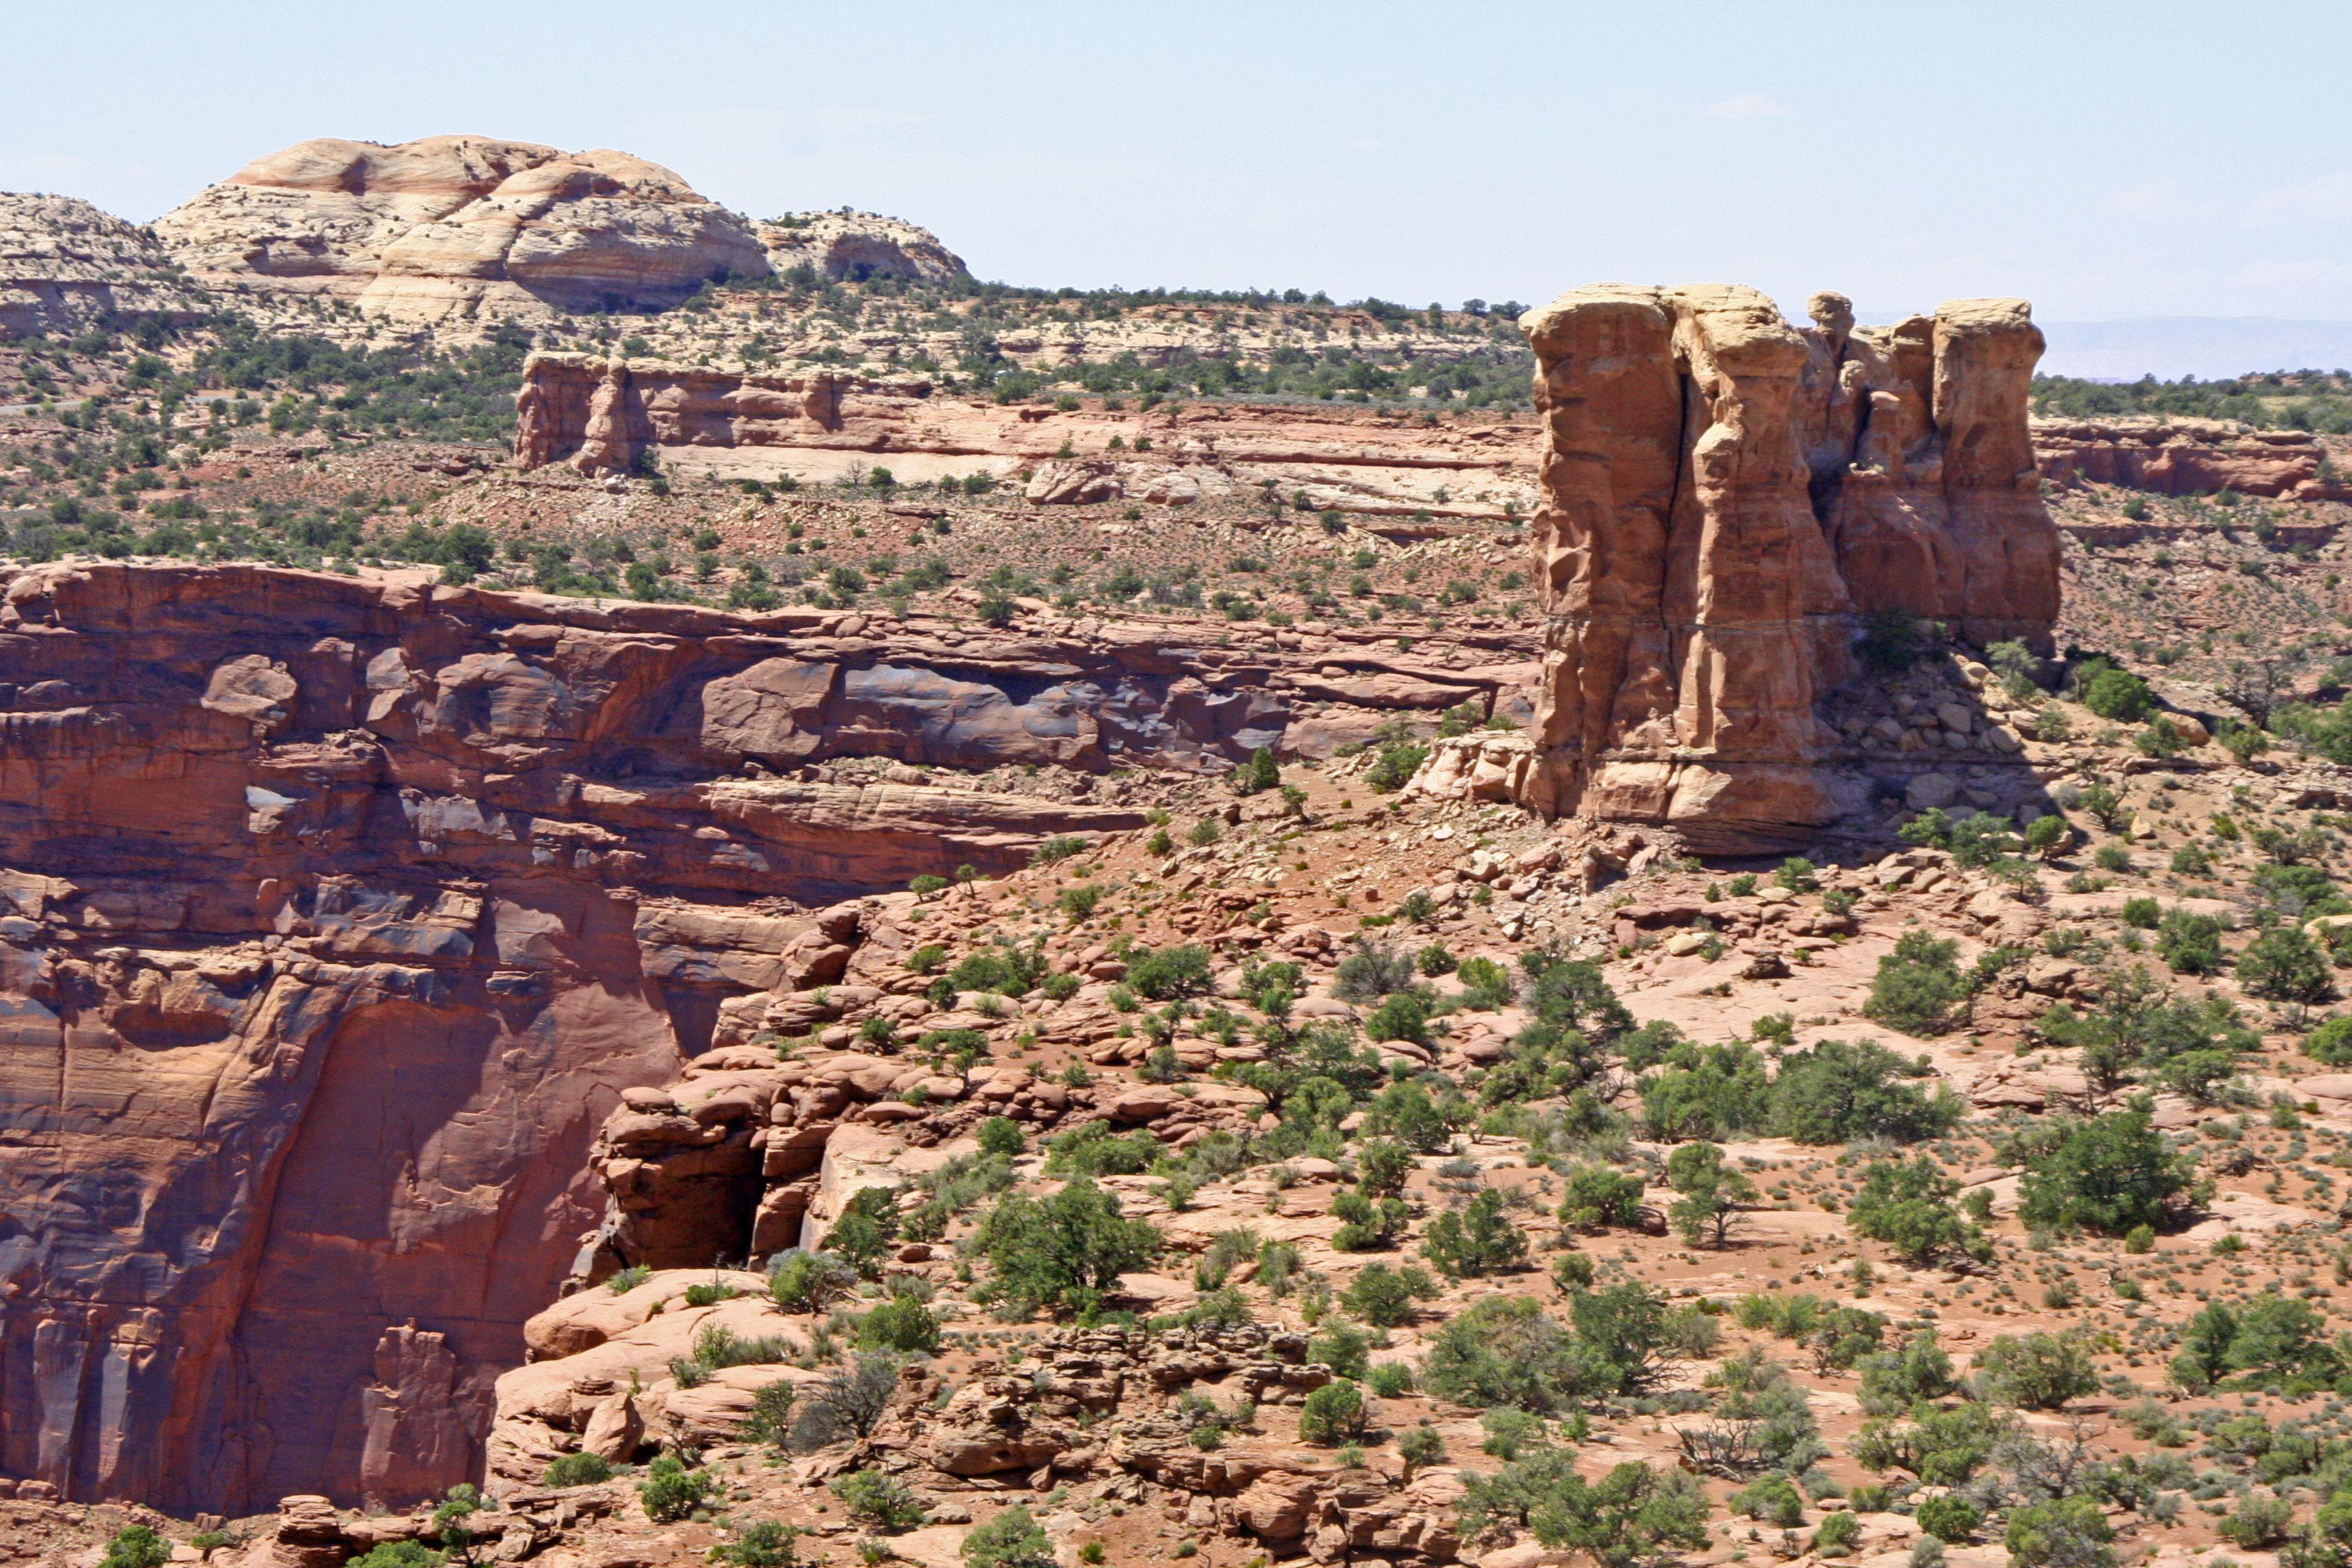 Arid Climate | The semi-arid climate, erosive forces of ...